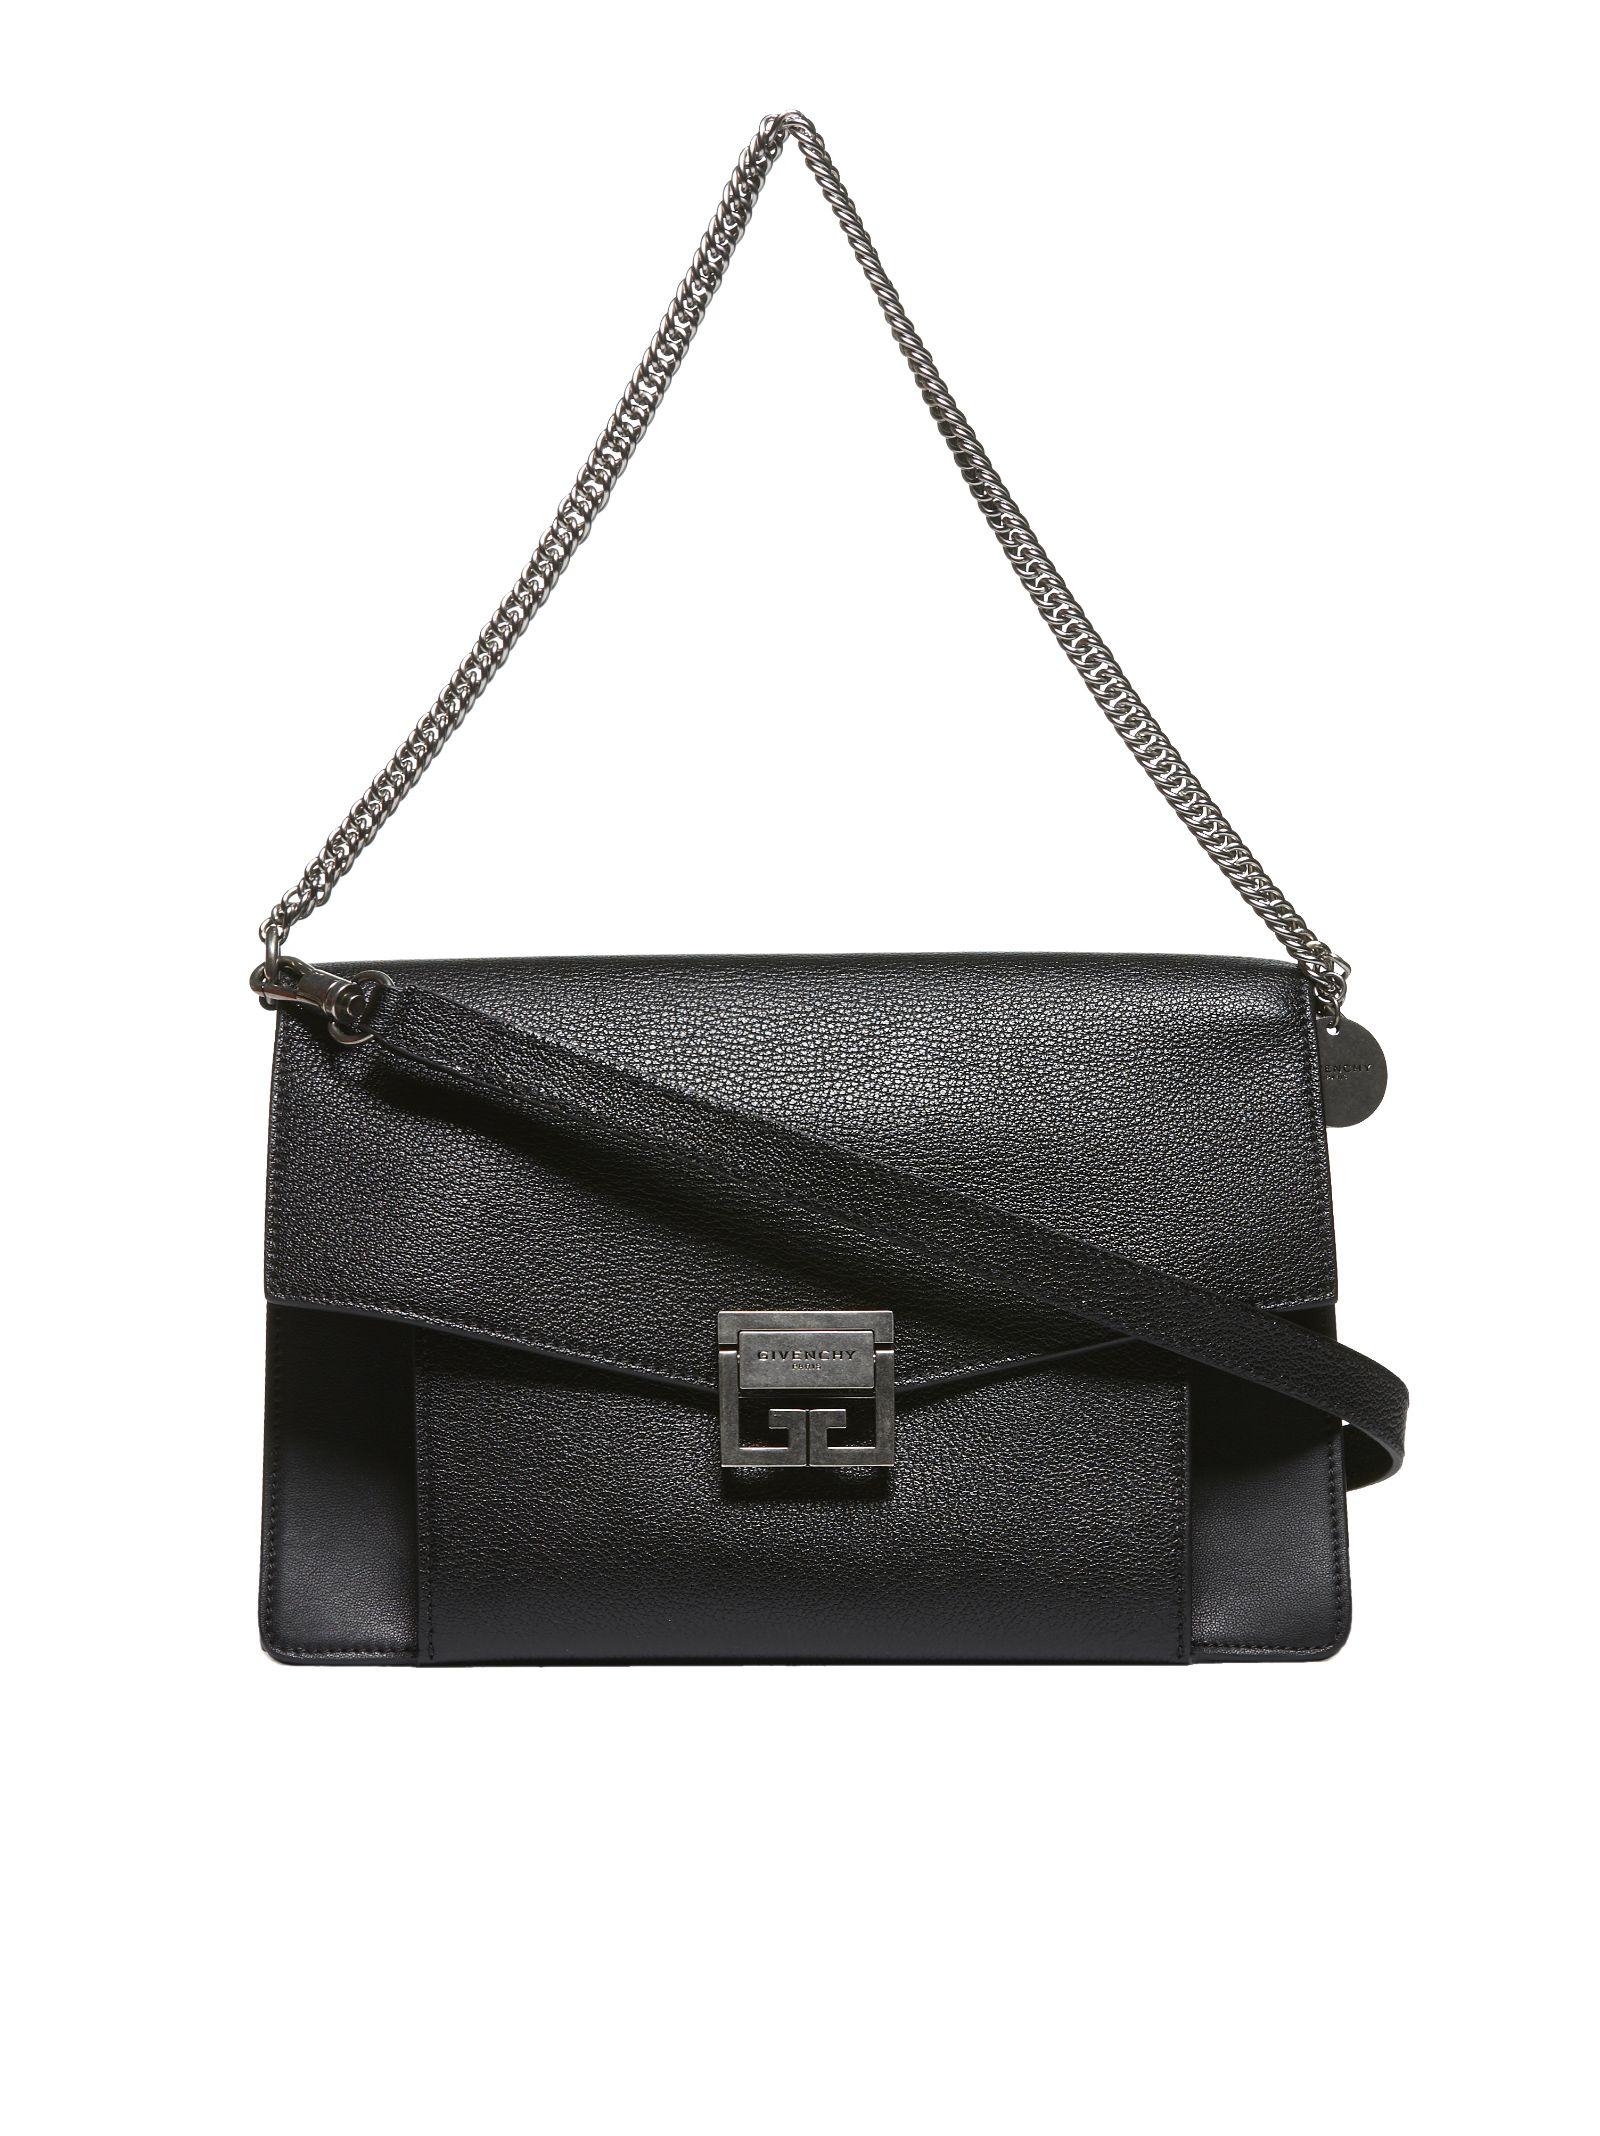 bc0e4552de52 Givenchy Givenchy Gv3 Shoulder Bag - Black - 10786981